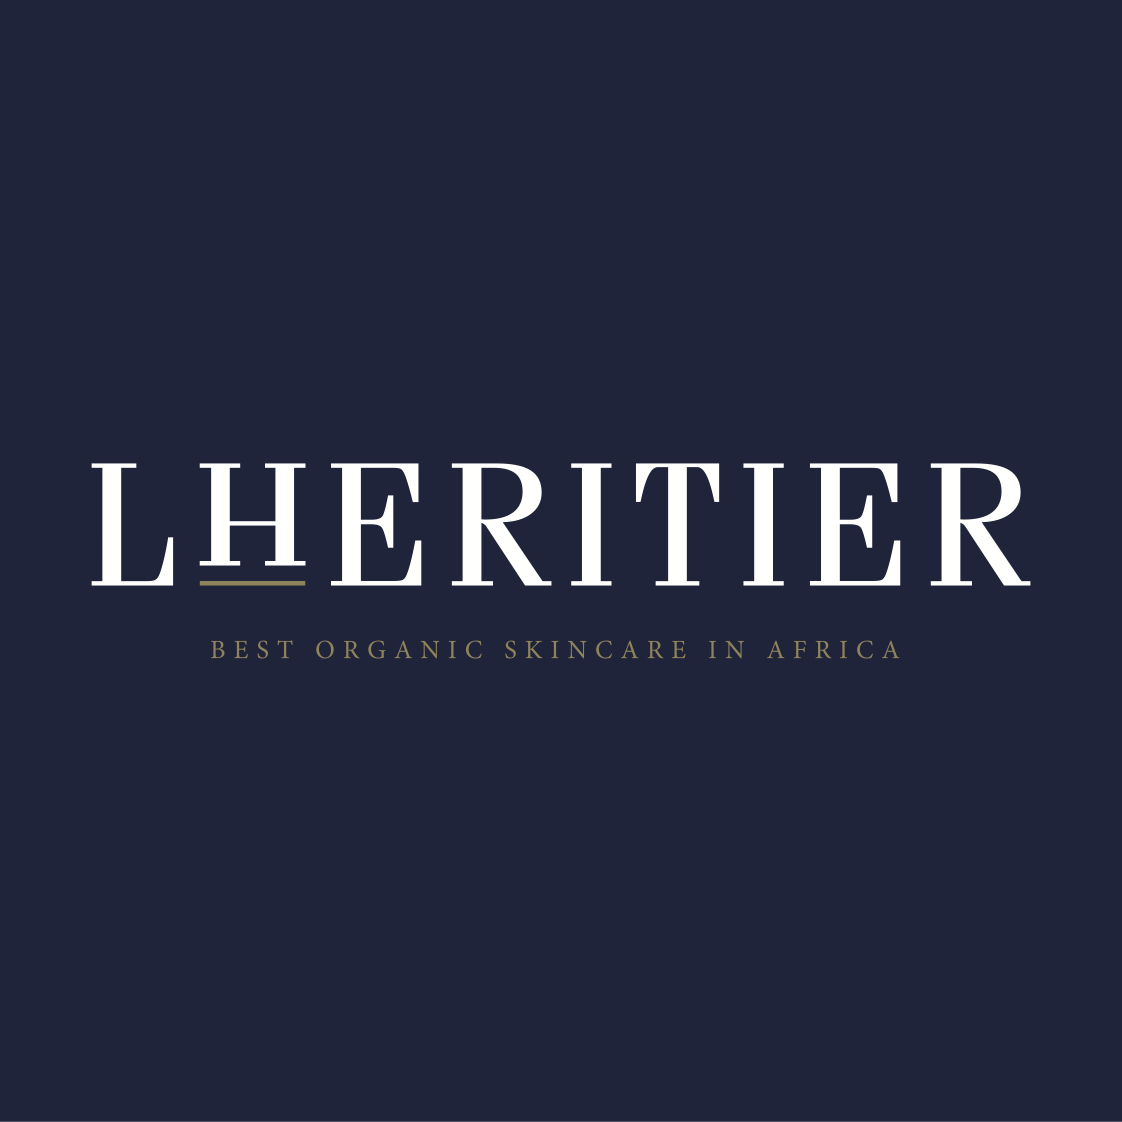 Lheritier 1789's logo